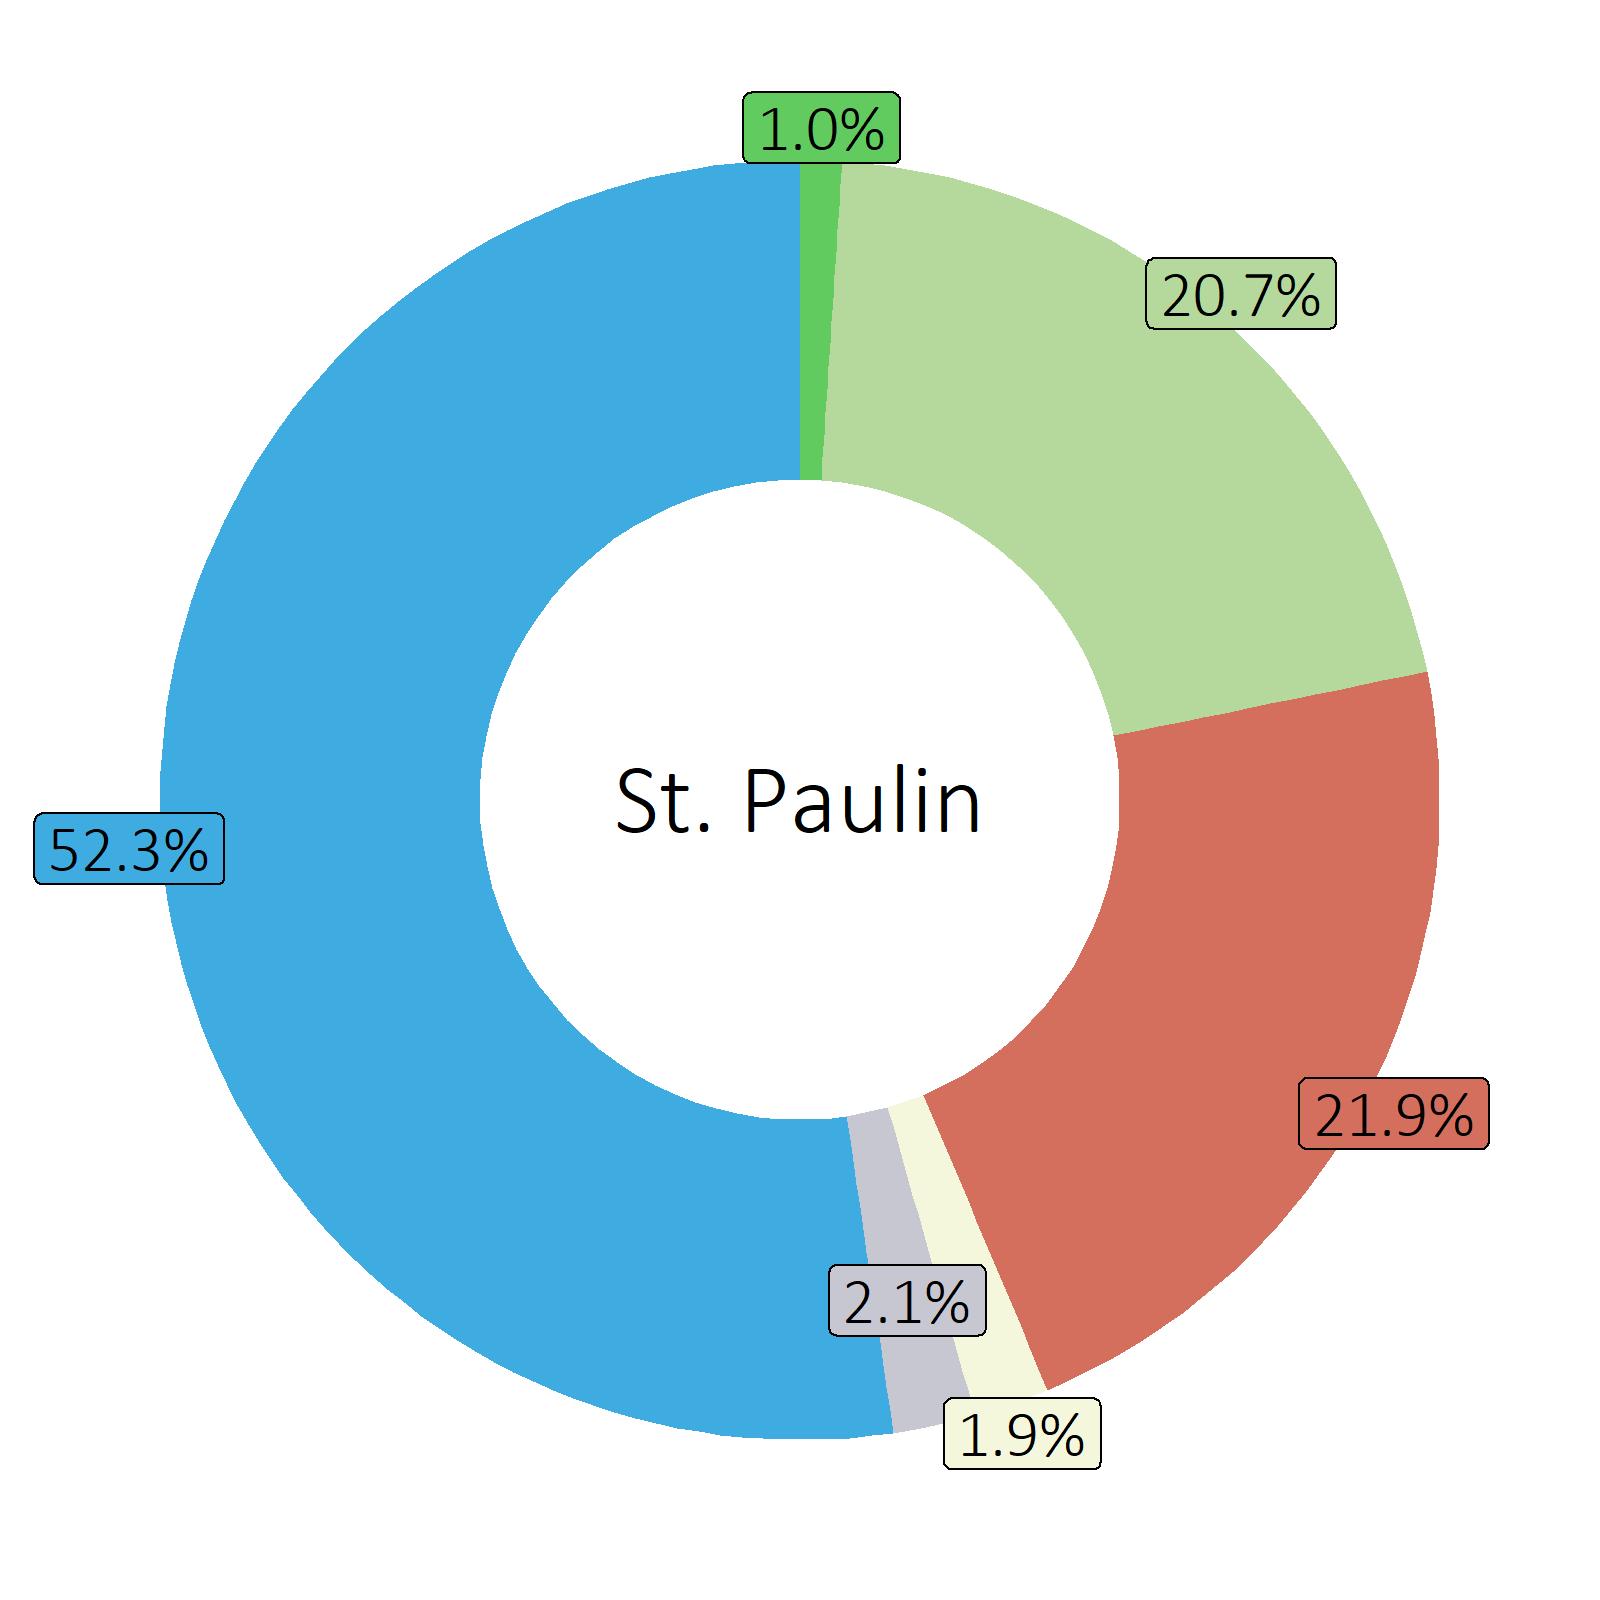 Bestandteile St. Paulin